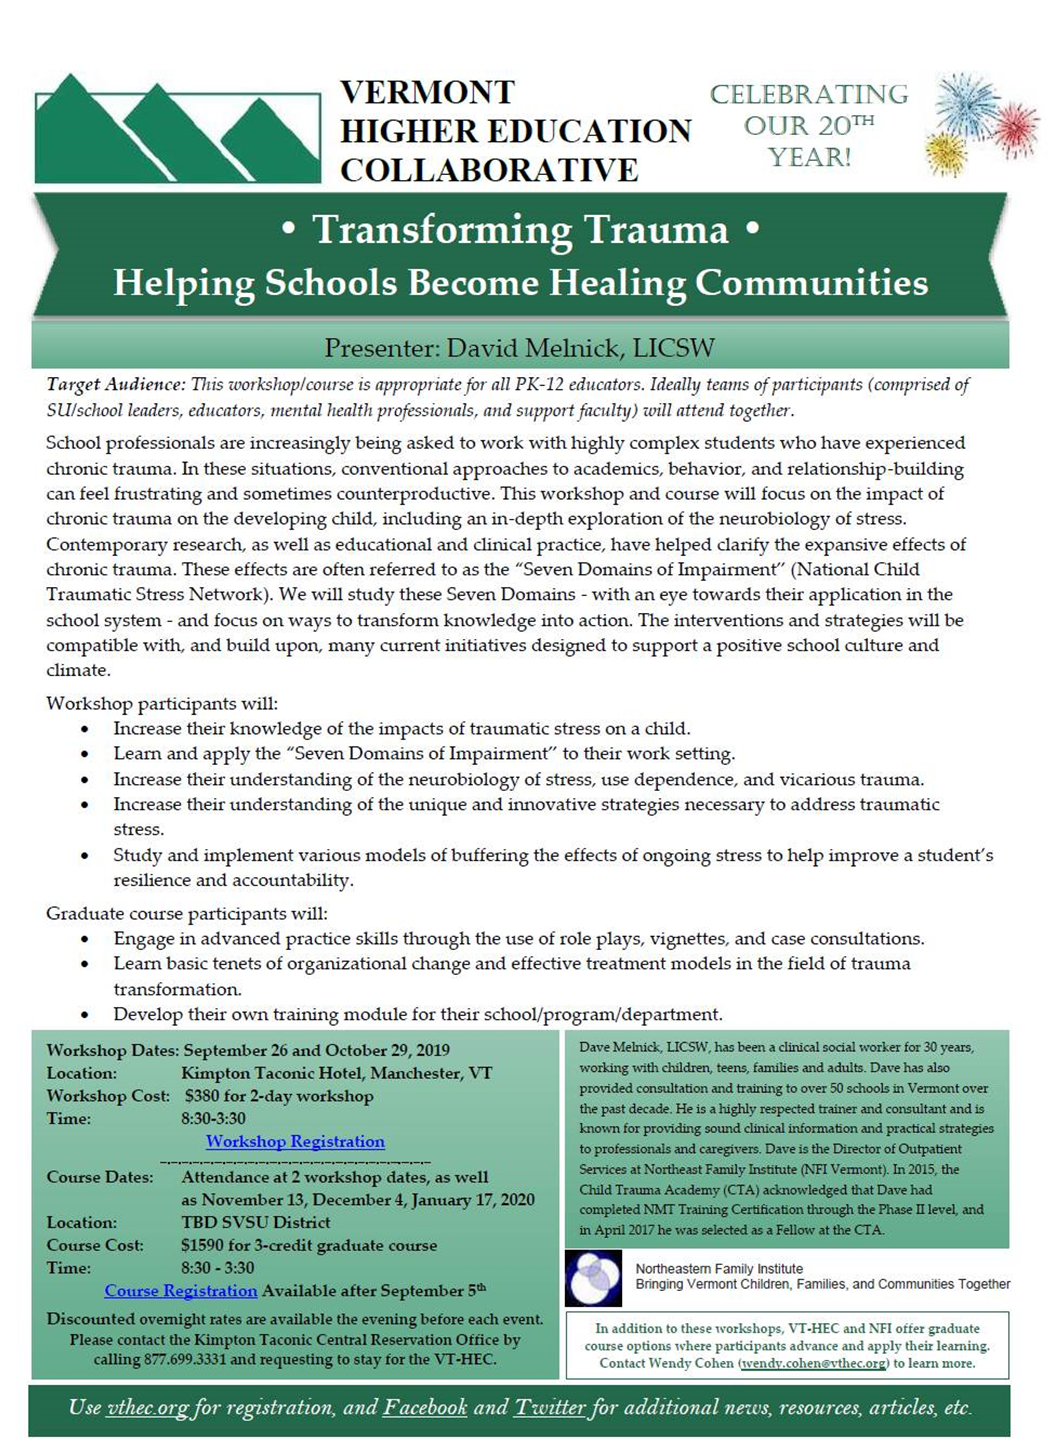 Transforming Trauma: Helping Schools Become Healing Communities